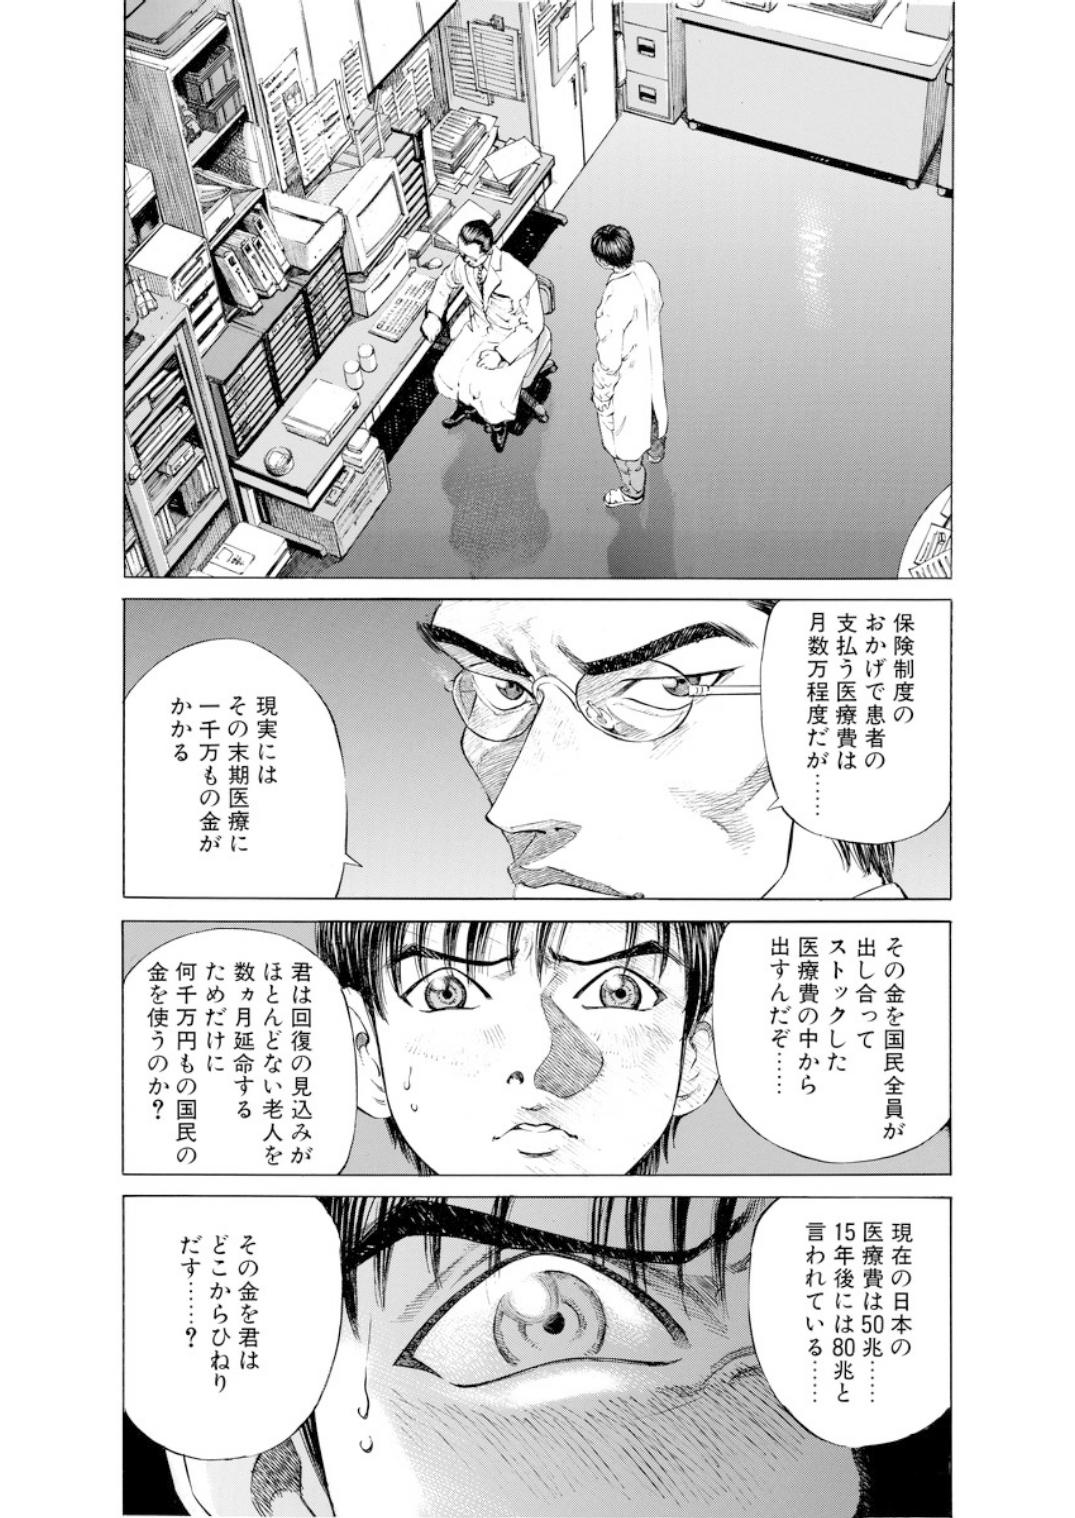 001bj_page-0101.jpg